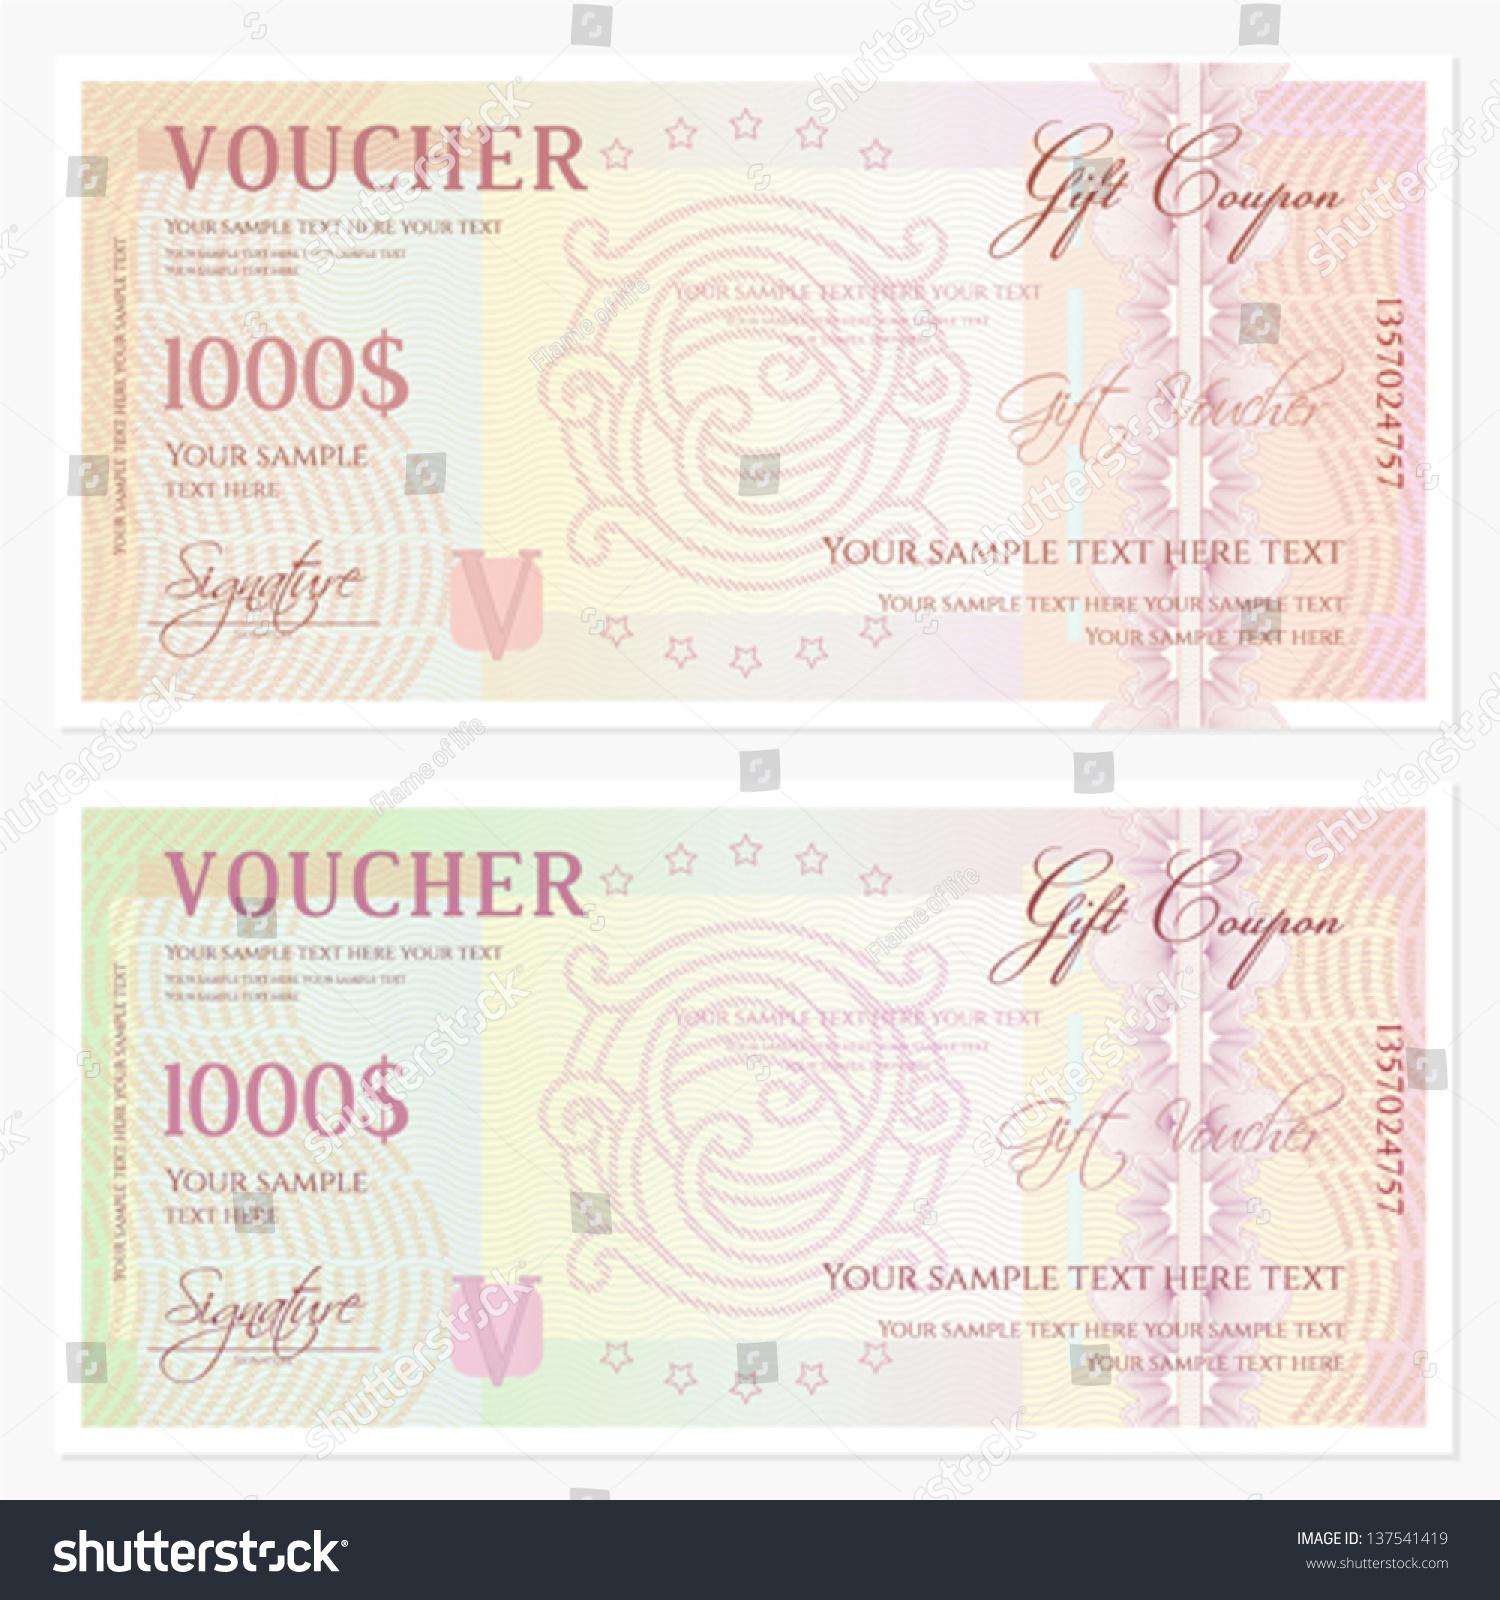 Voucher Gift Certificate Template Guilloche Pattern Stock Vector